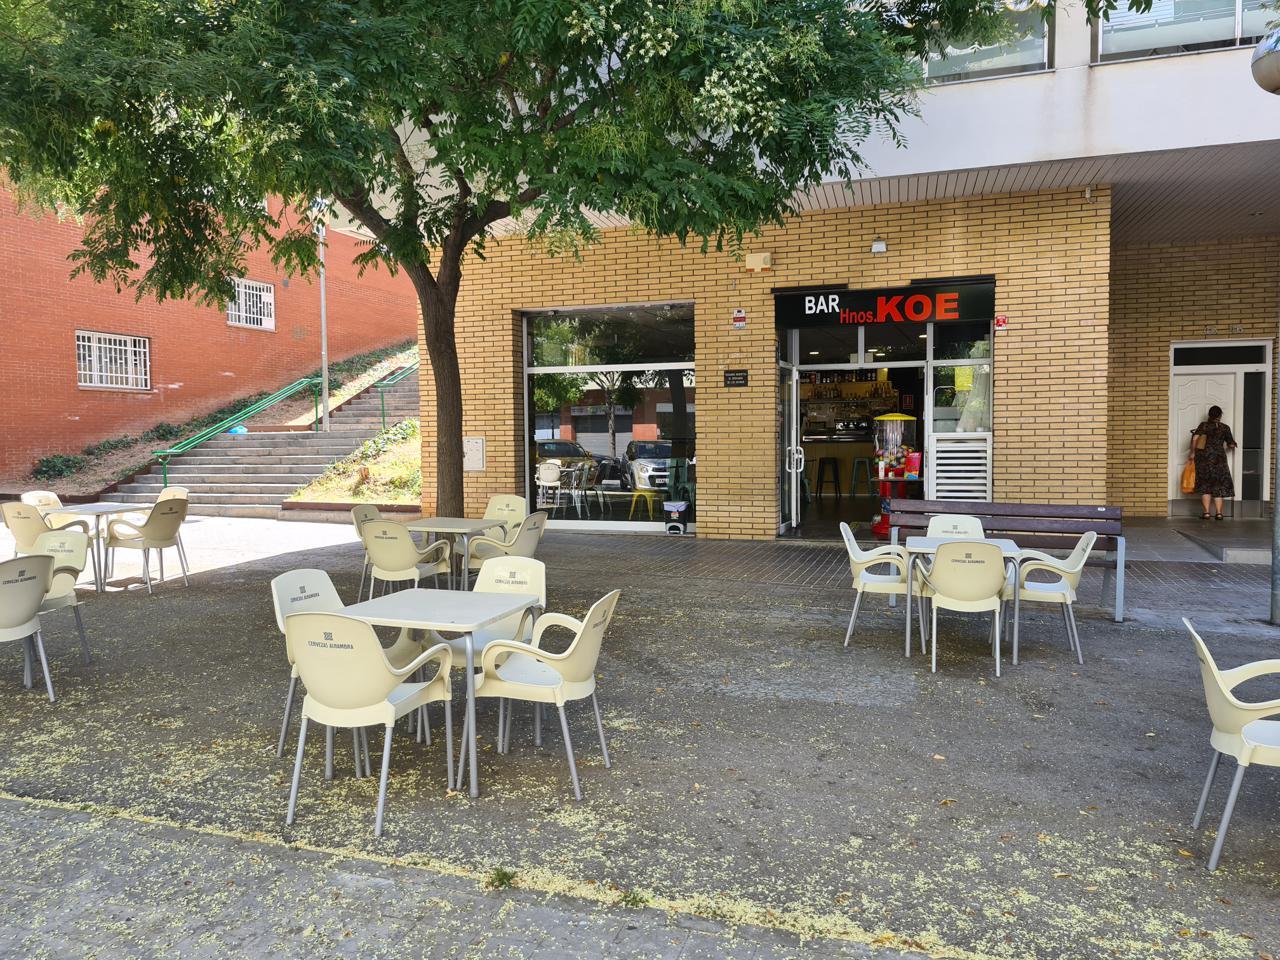 Pas-de-porte Local commercial  Calle carrer alemanya, 46. Se vende/traspasa bar-restaurante en c/ alemanya de mataró. en f